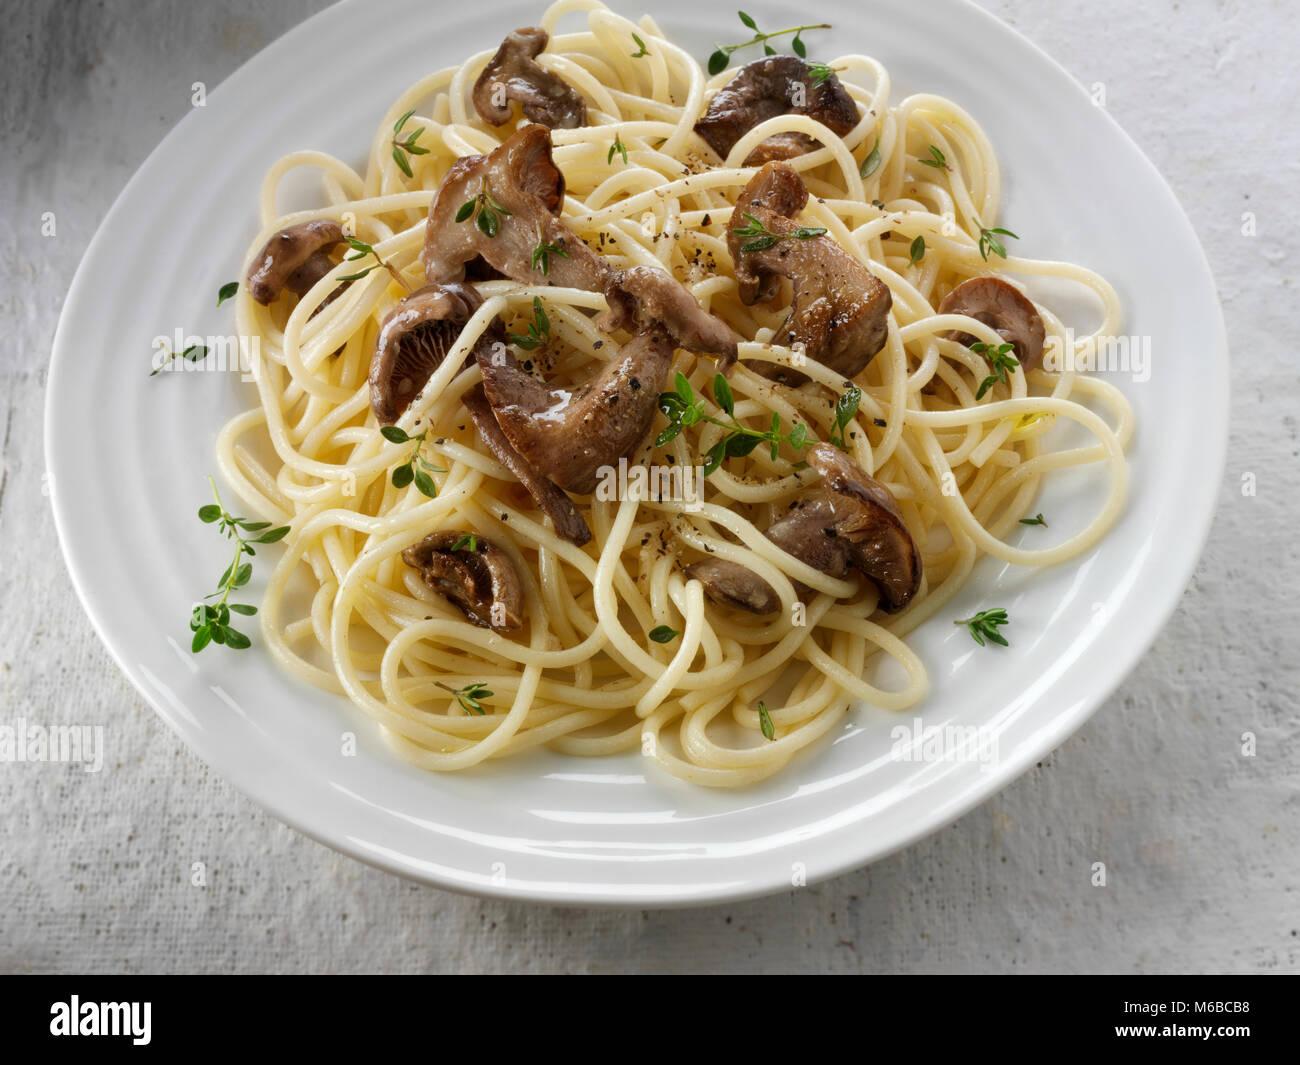 Sauteed wiild organische Pied Bleu Pilze (Clitocybe nuda) oder Blaue Fuß Champignons in Butter mit Spaghetti gekocht Stockfoto